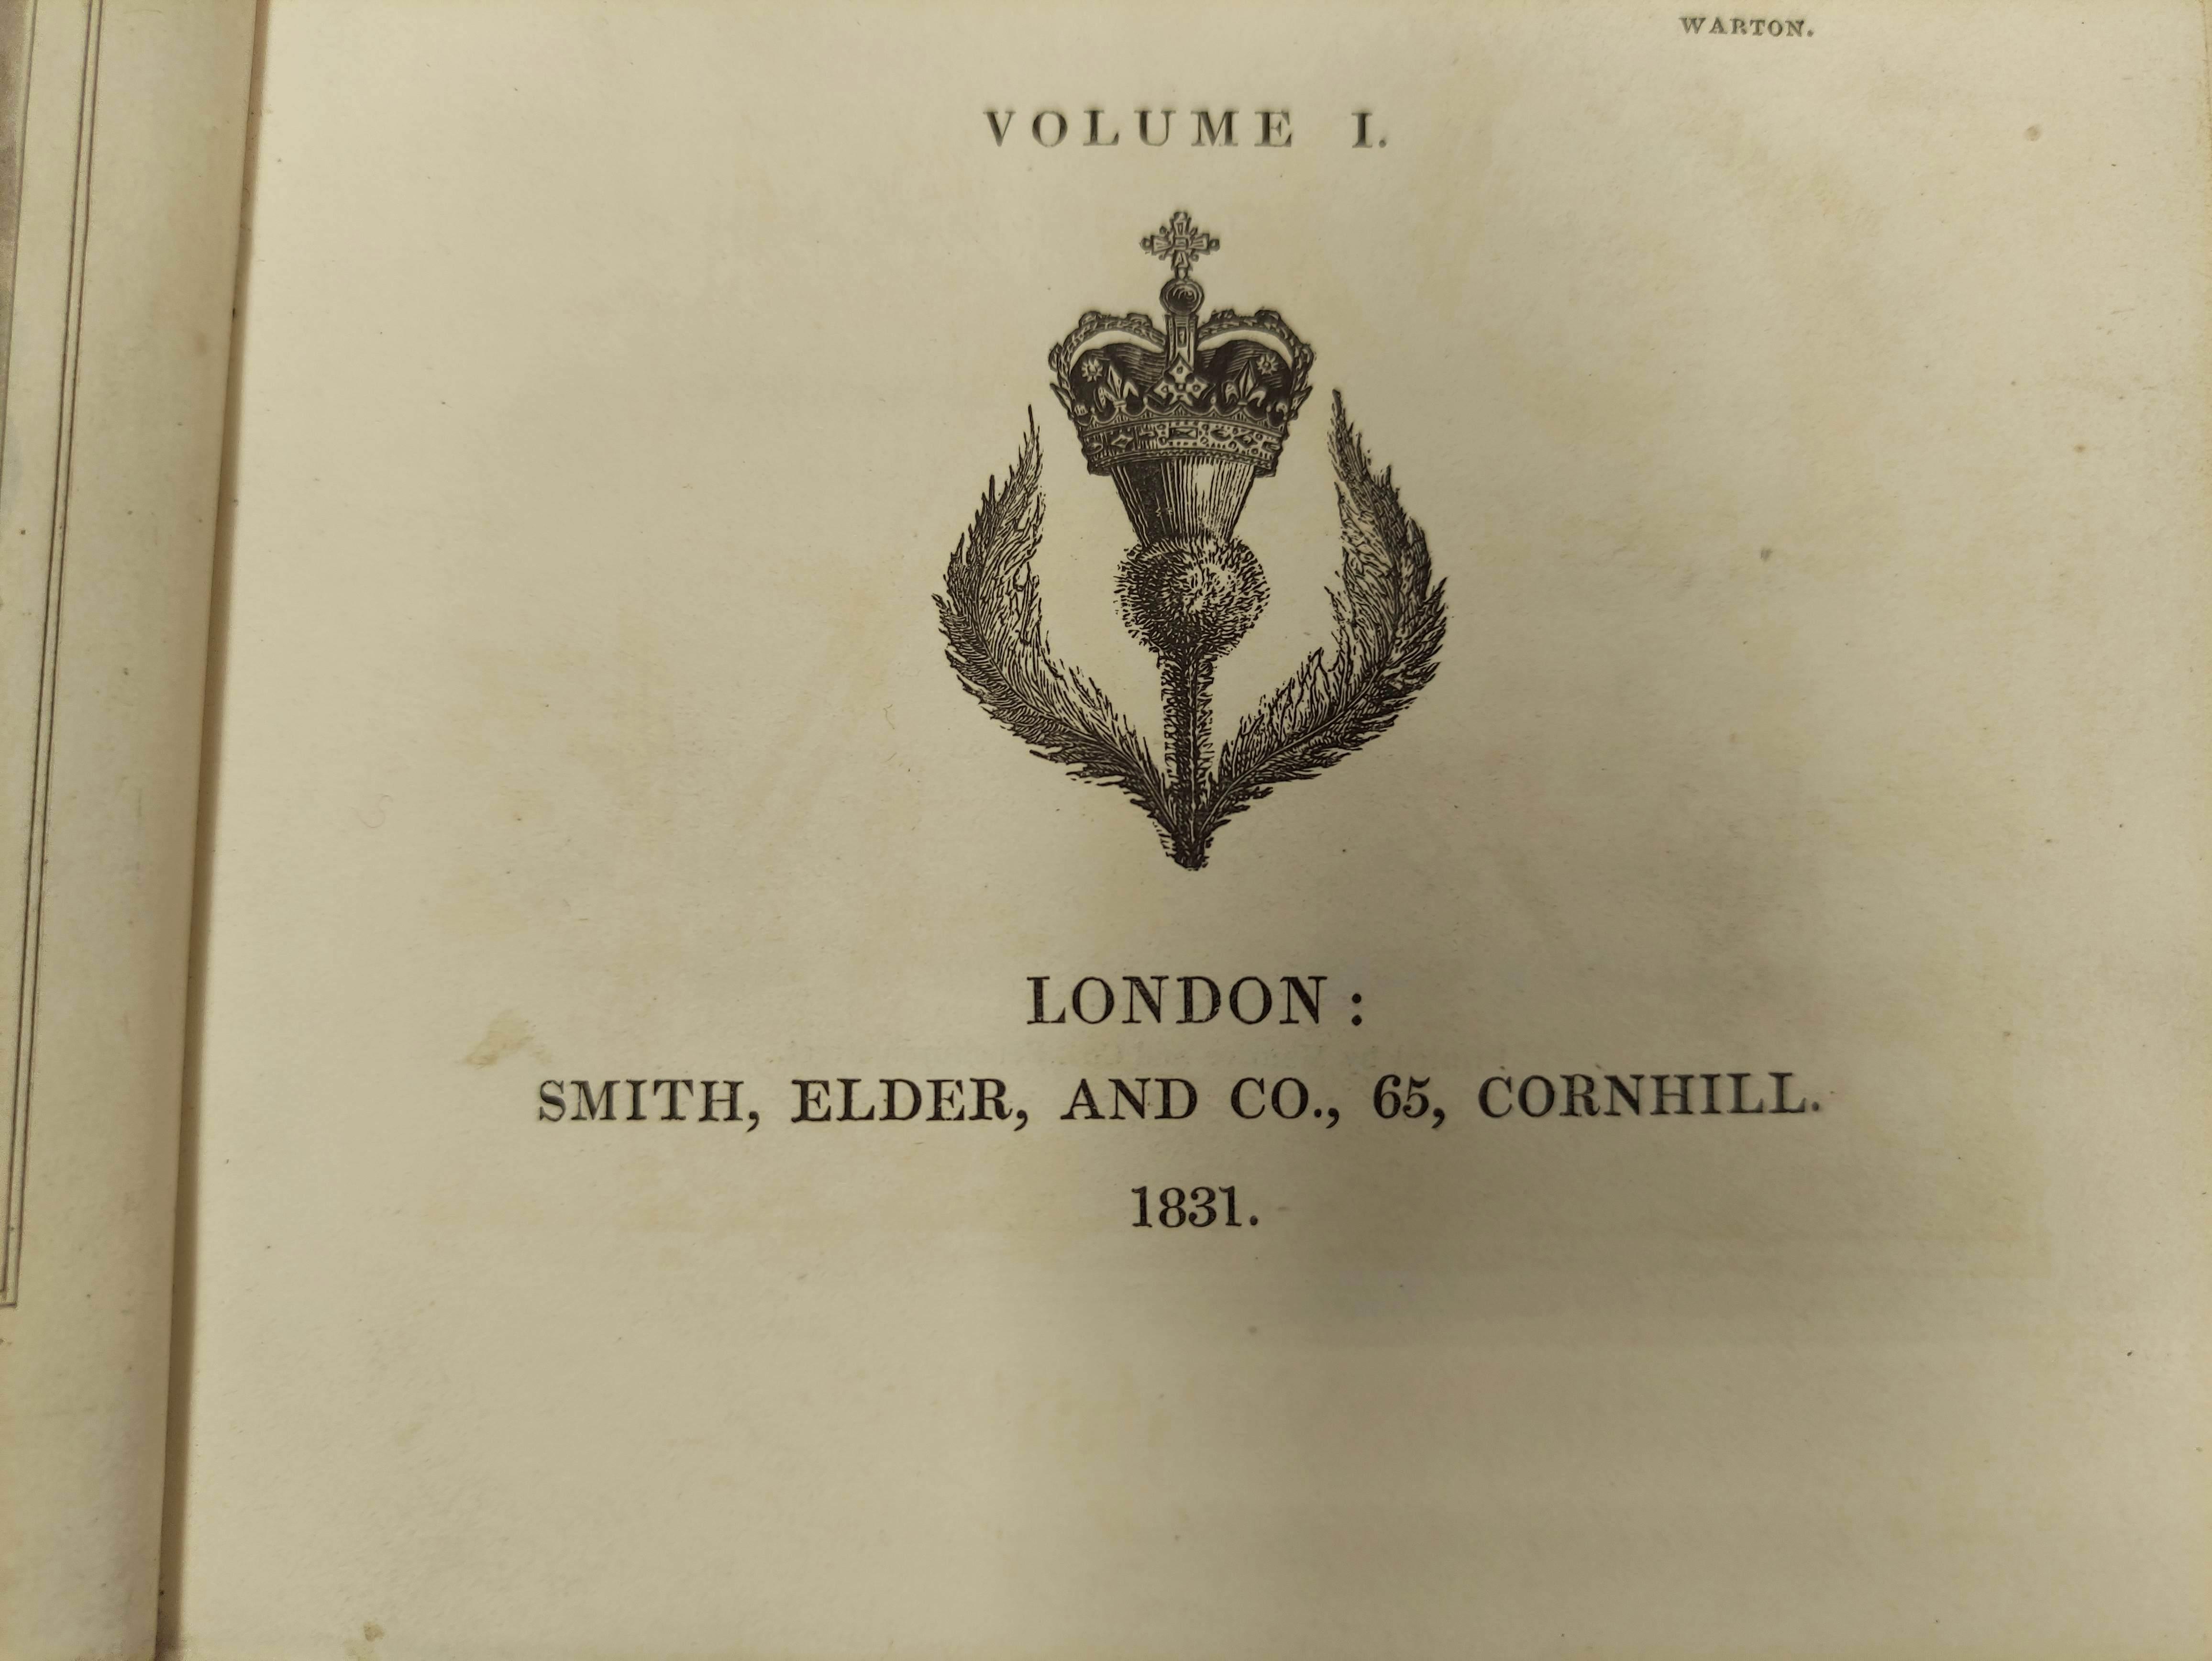 LOGAN JAMES.The Scottish Gael. 2 vols. Col. frontis & text illus. Half green morocco. A nice - Image 4 of 10